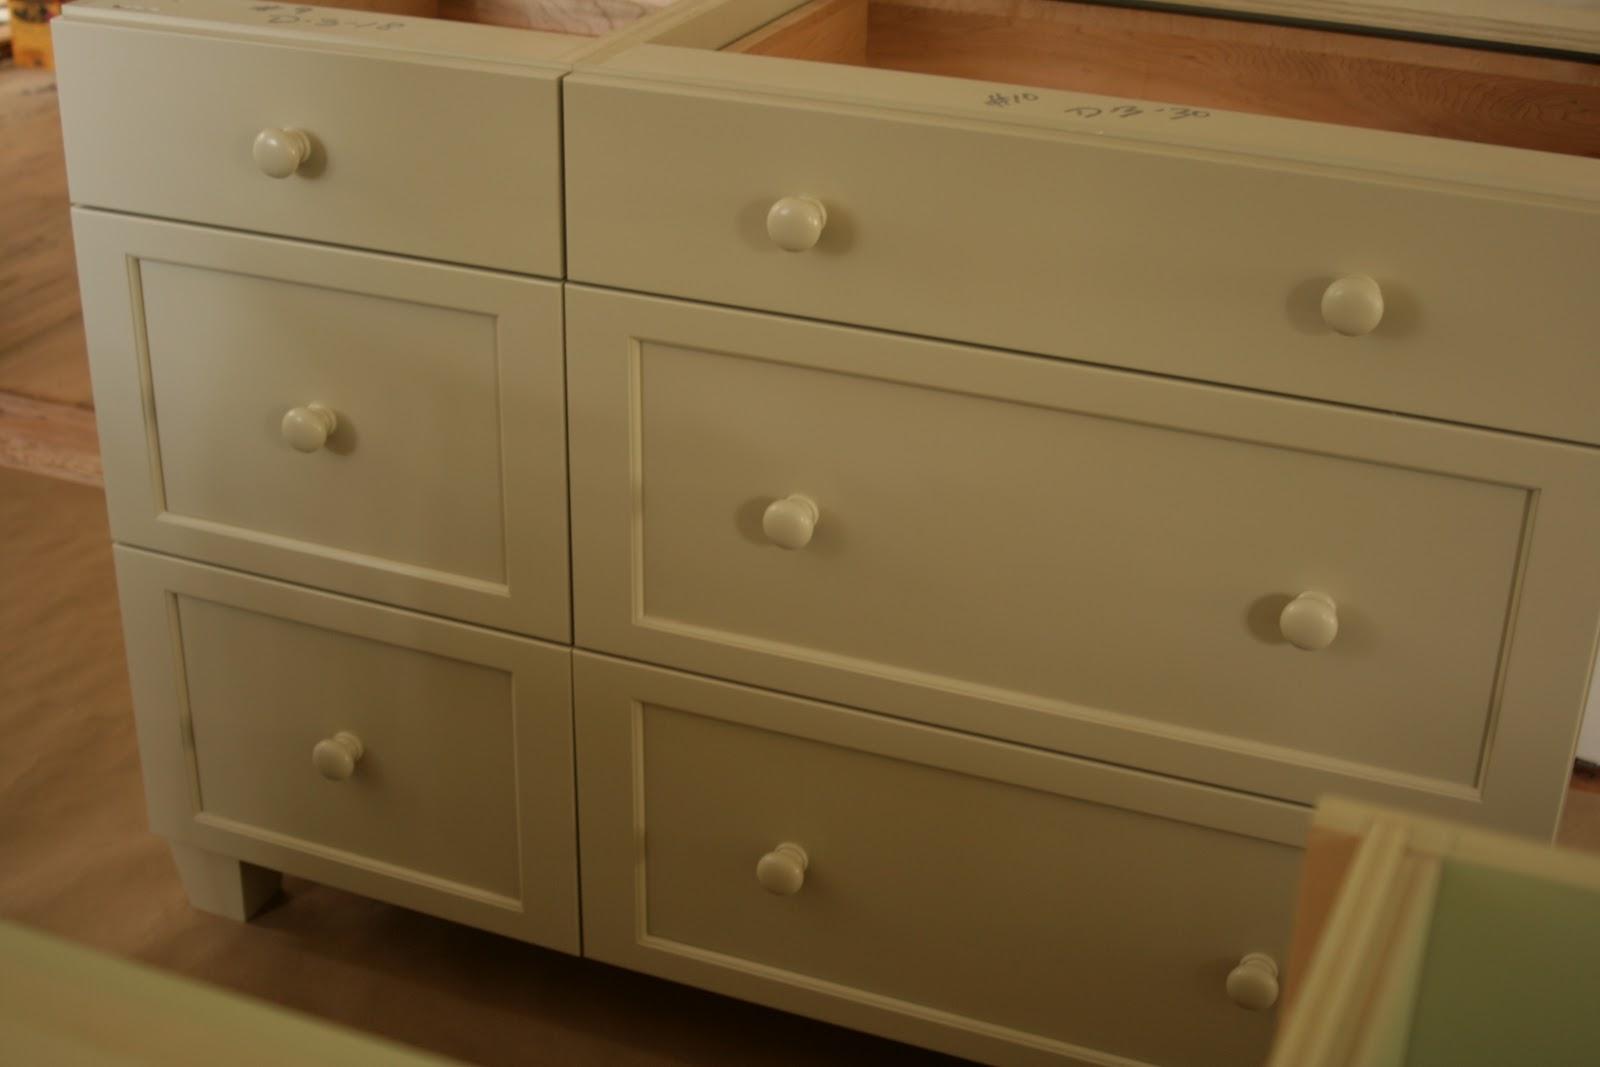 Ebay Kitchen Cabinets For Sale